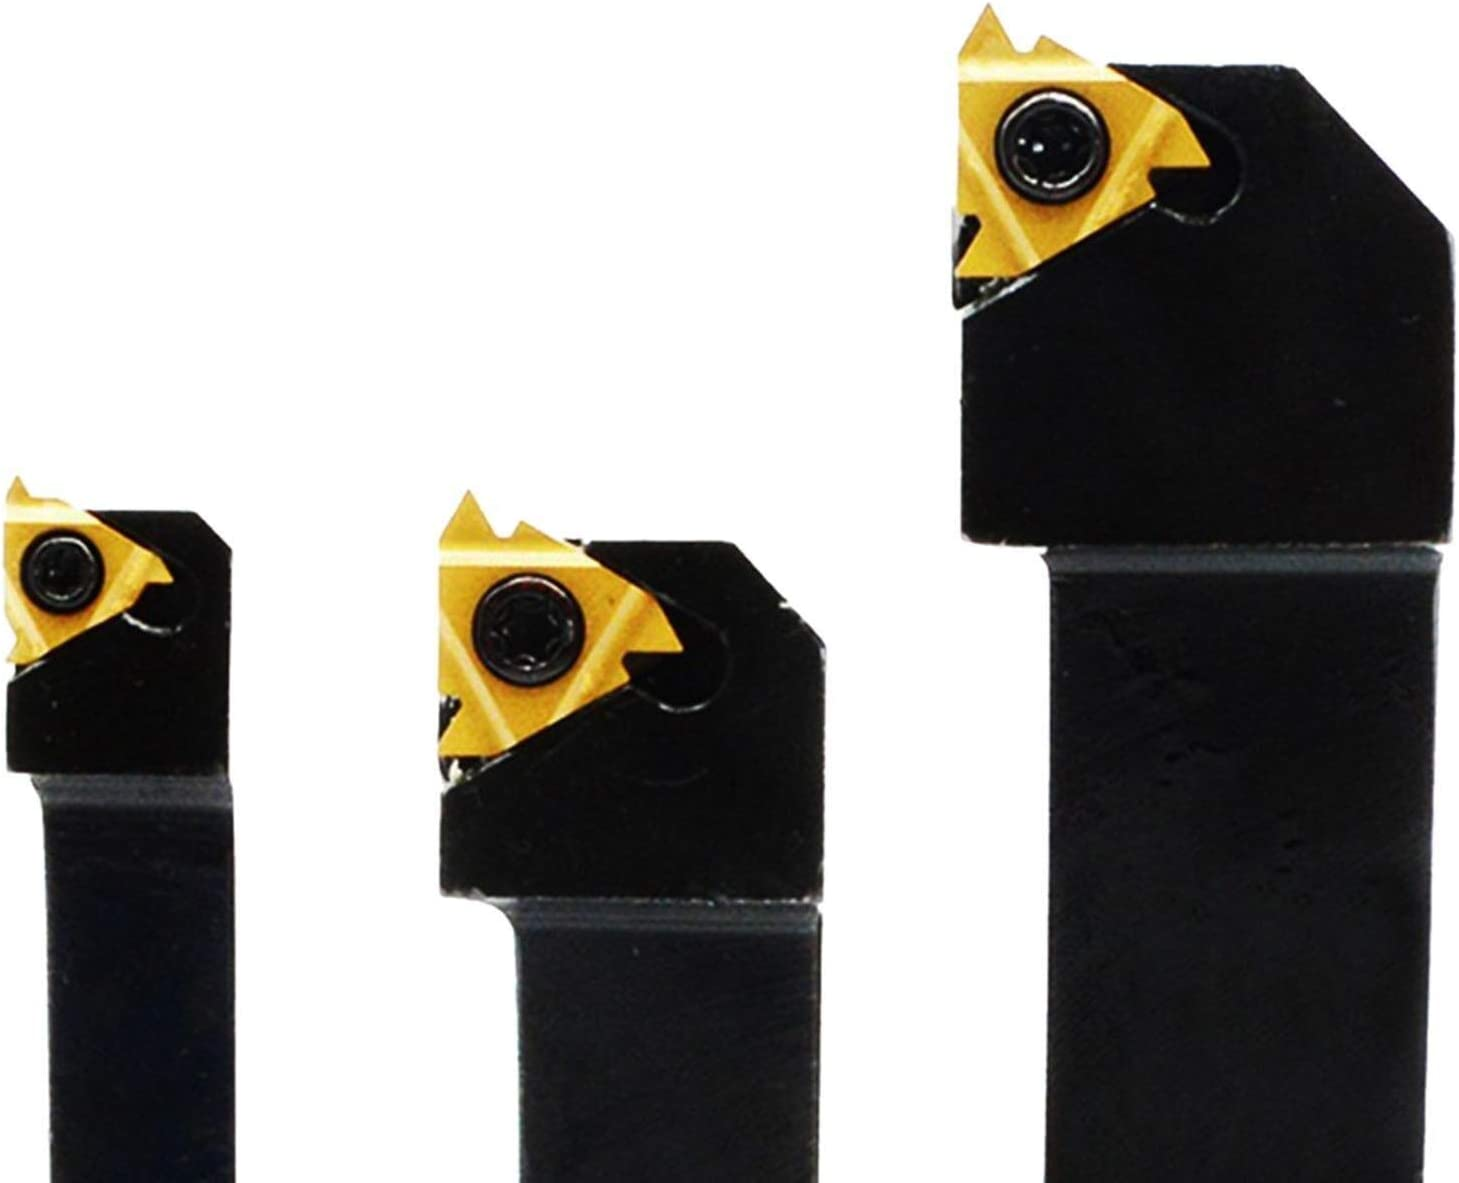 YUQIYU CNC Lathe Carbide Indexable Threading Turning Tool Holder with Indexable Insert Blade Kits